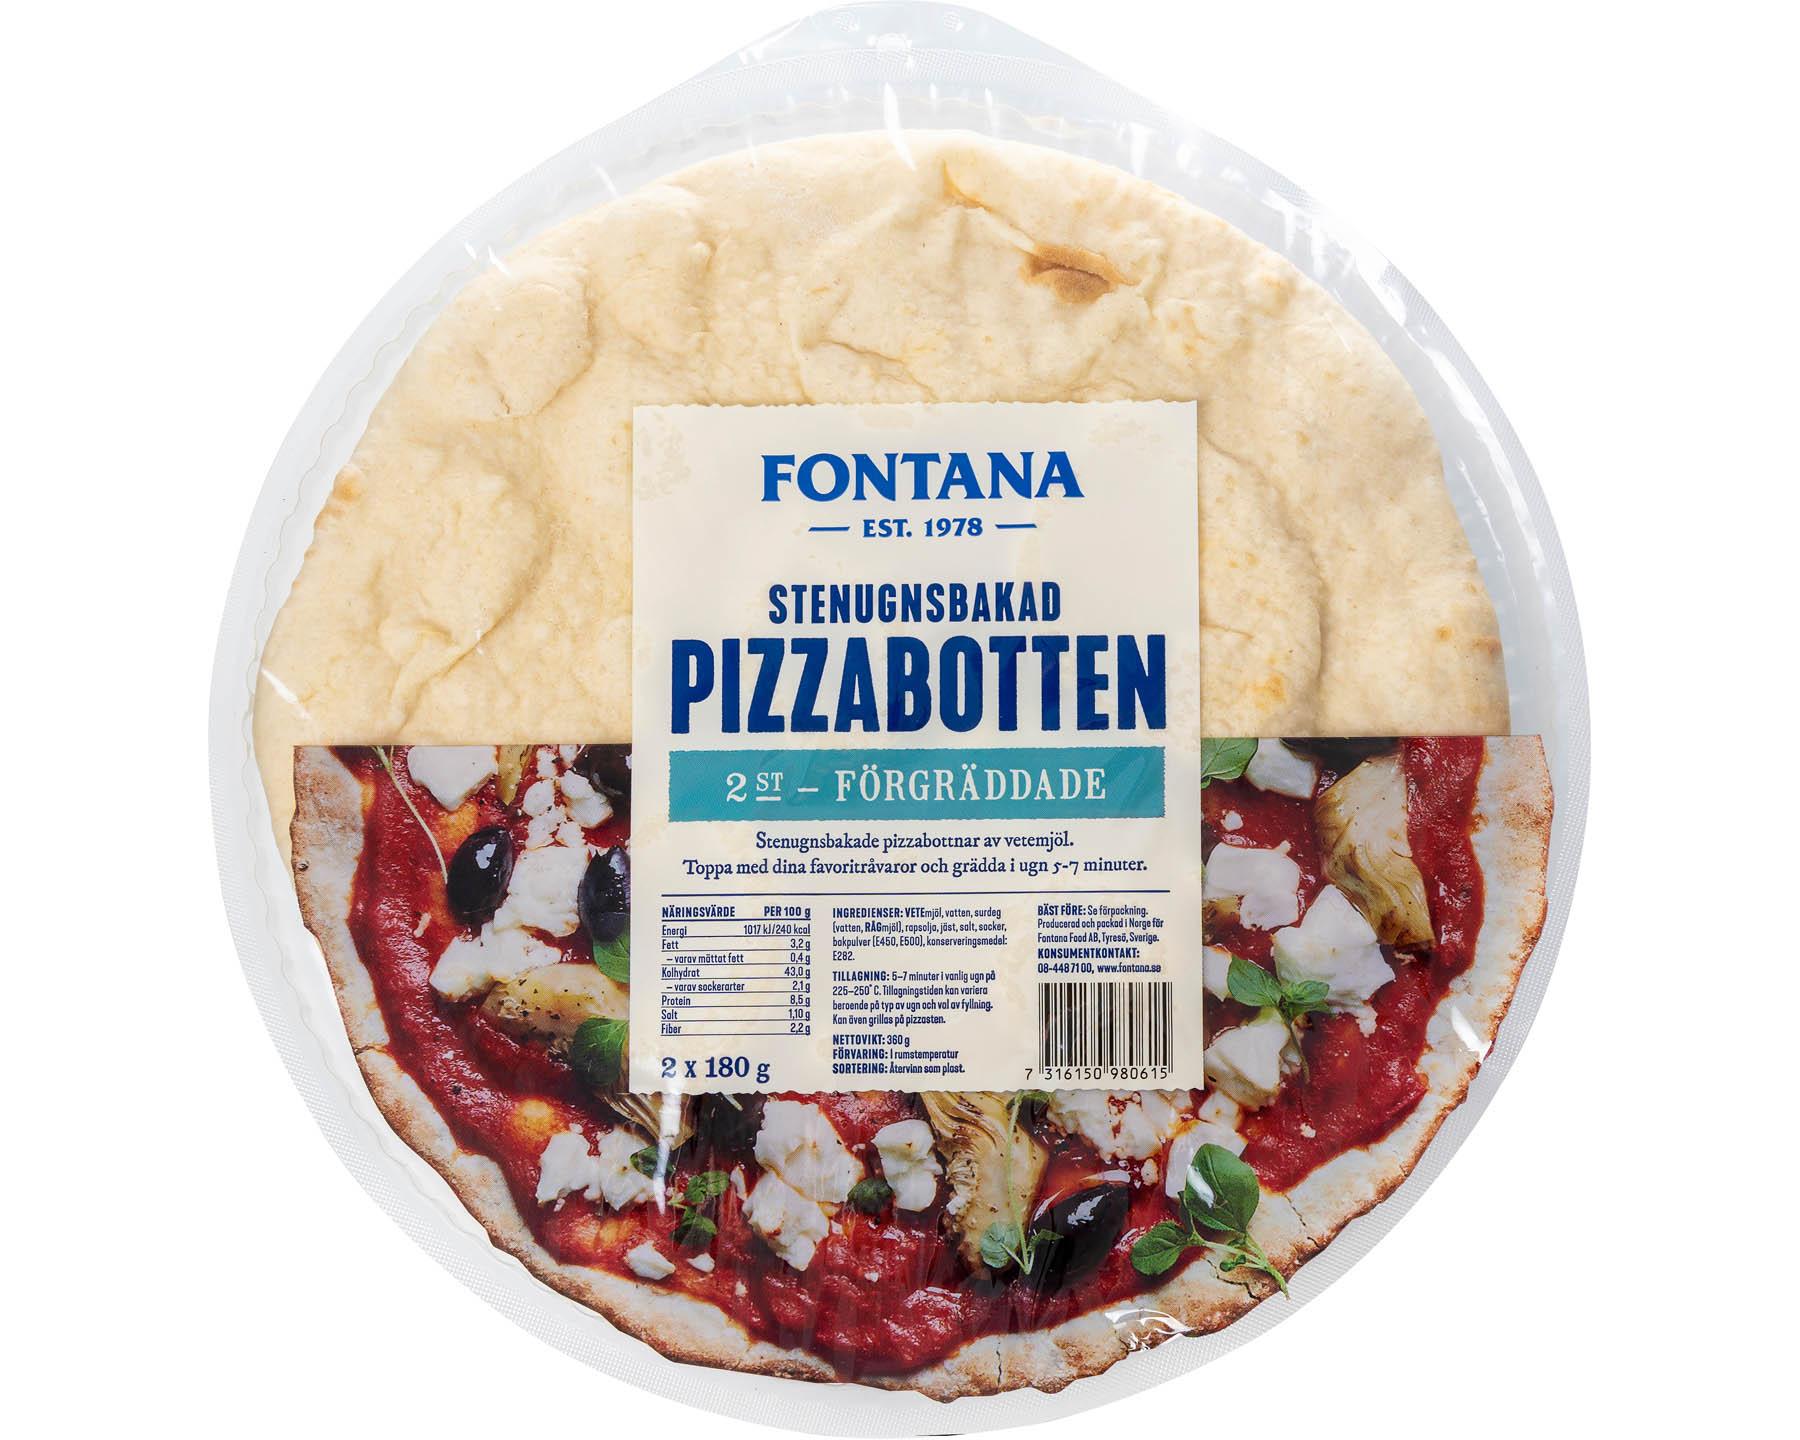 Fontana Stenugnsbakad Pizzabotten - Fullkorn